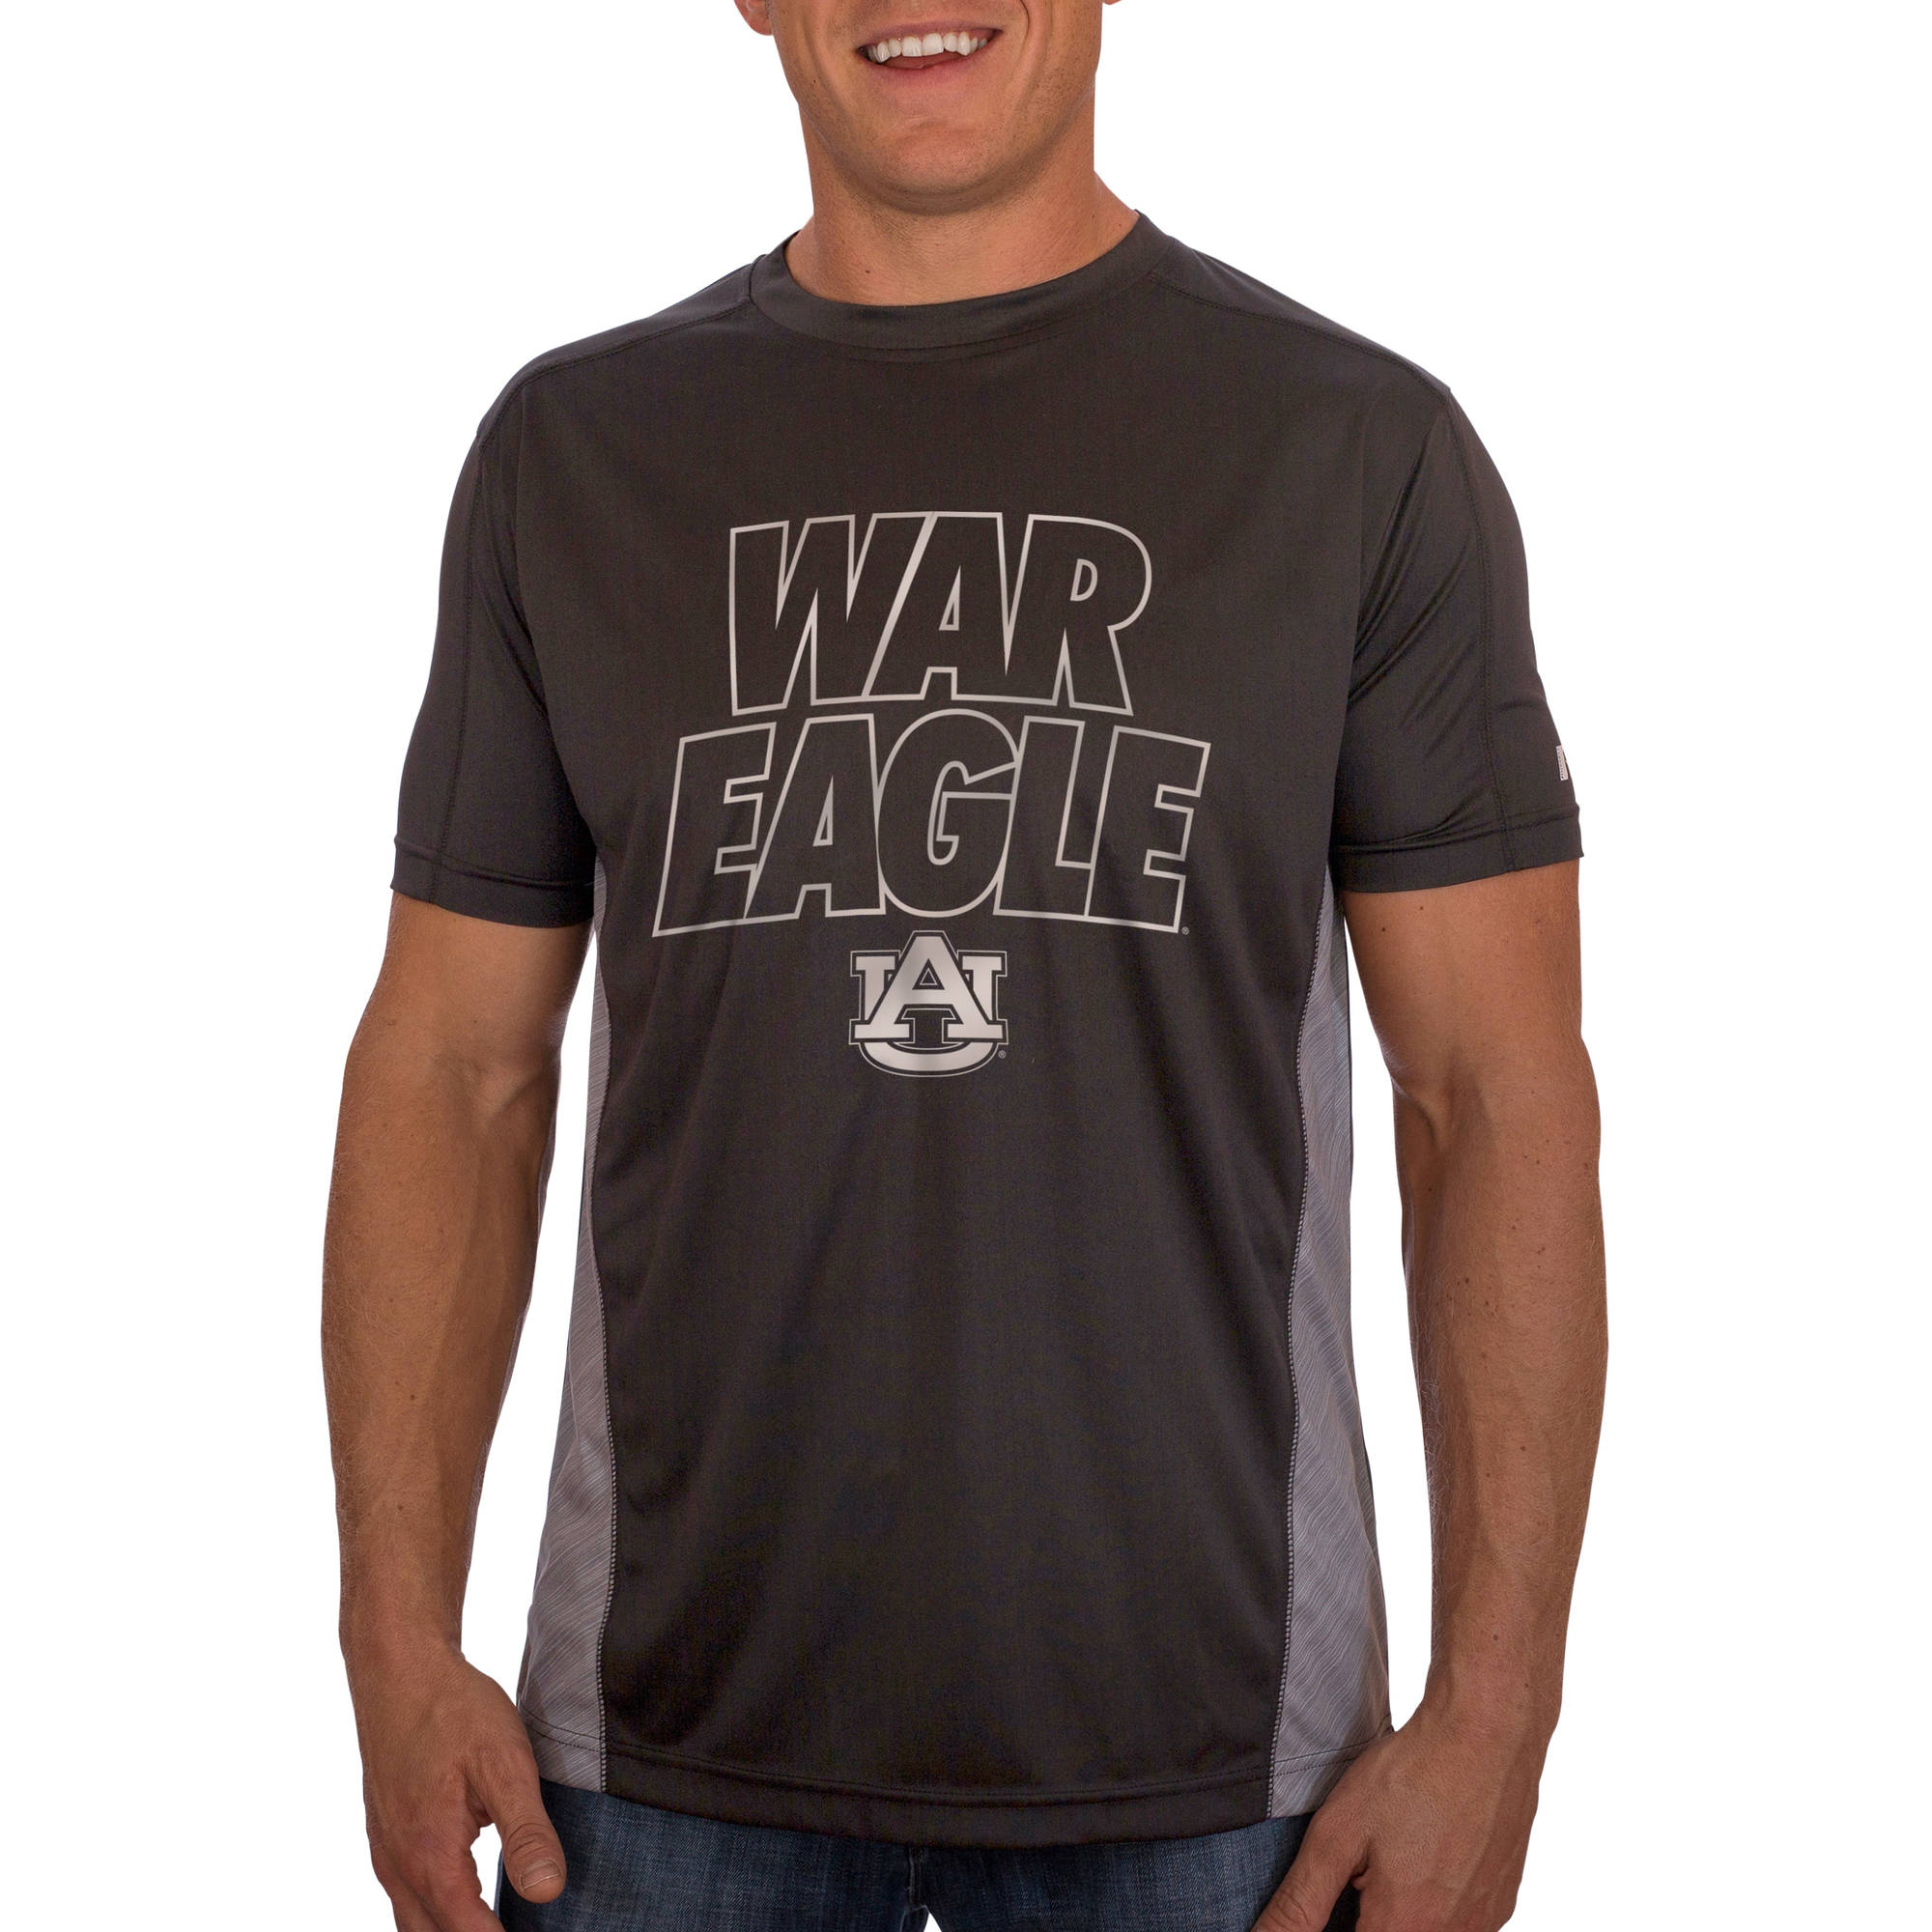 Russell NCAA Auburn Tigers Men's Athletic Fit Black / Storm Gray Impact Tee